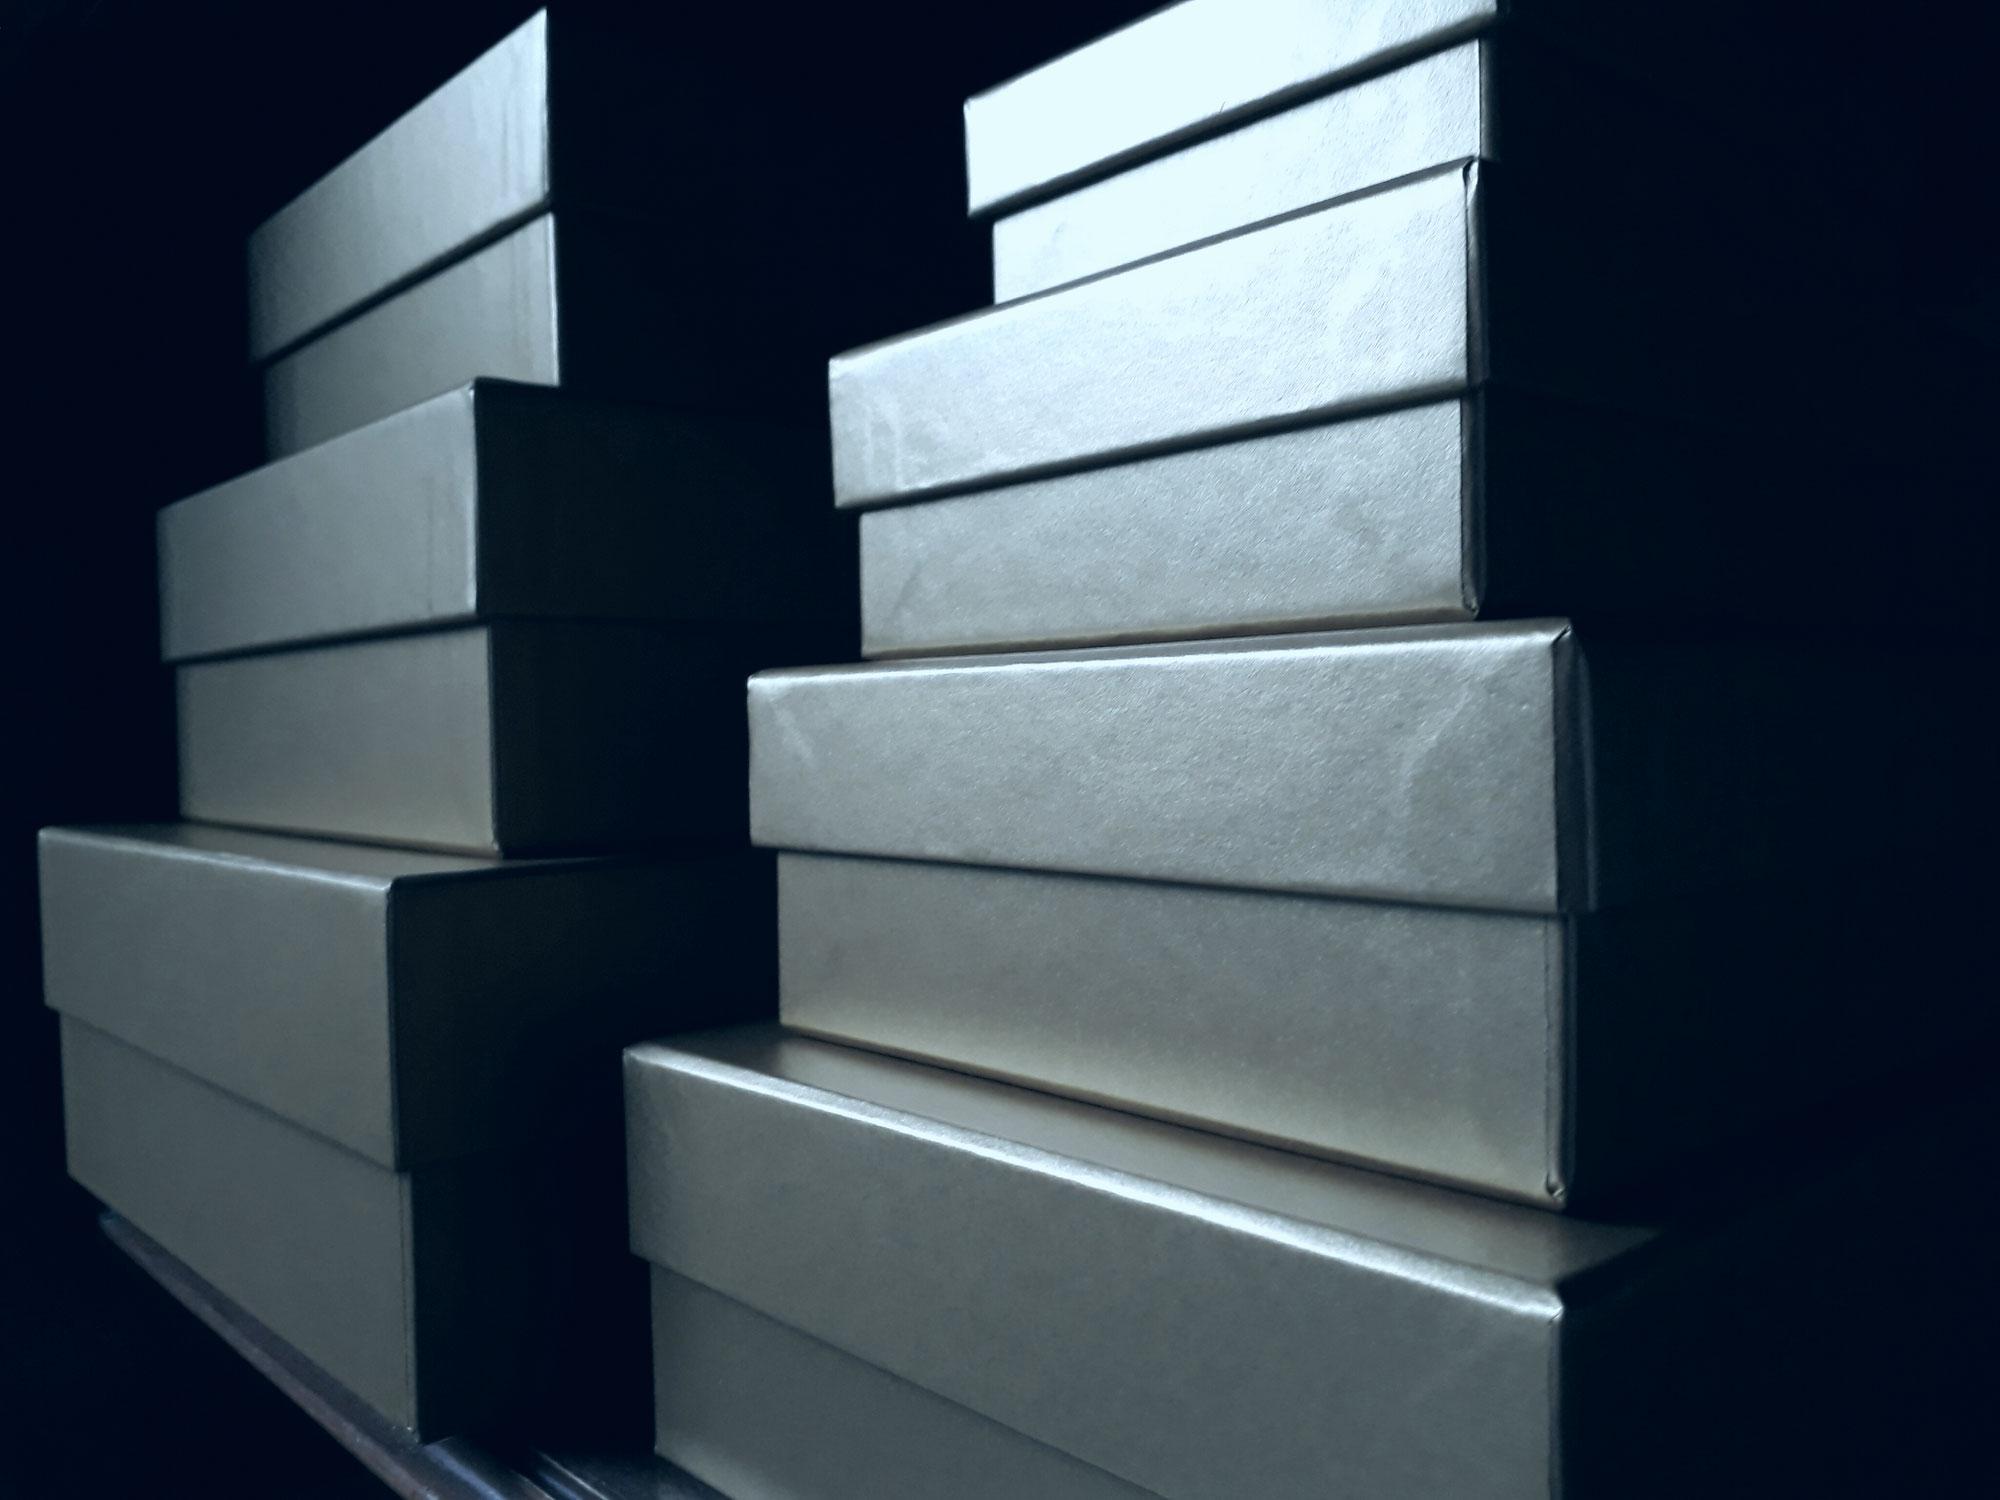 boxline dekorative kartonagen von r ssler papilando. Black Bedroom Furniture Sets. Home Design Ideas